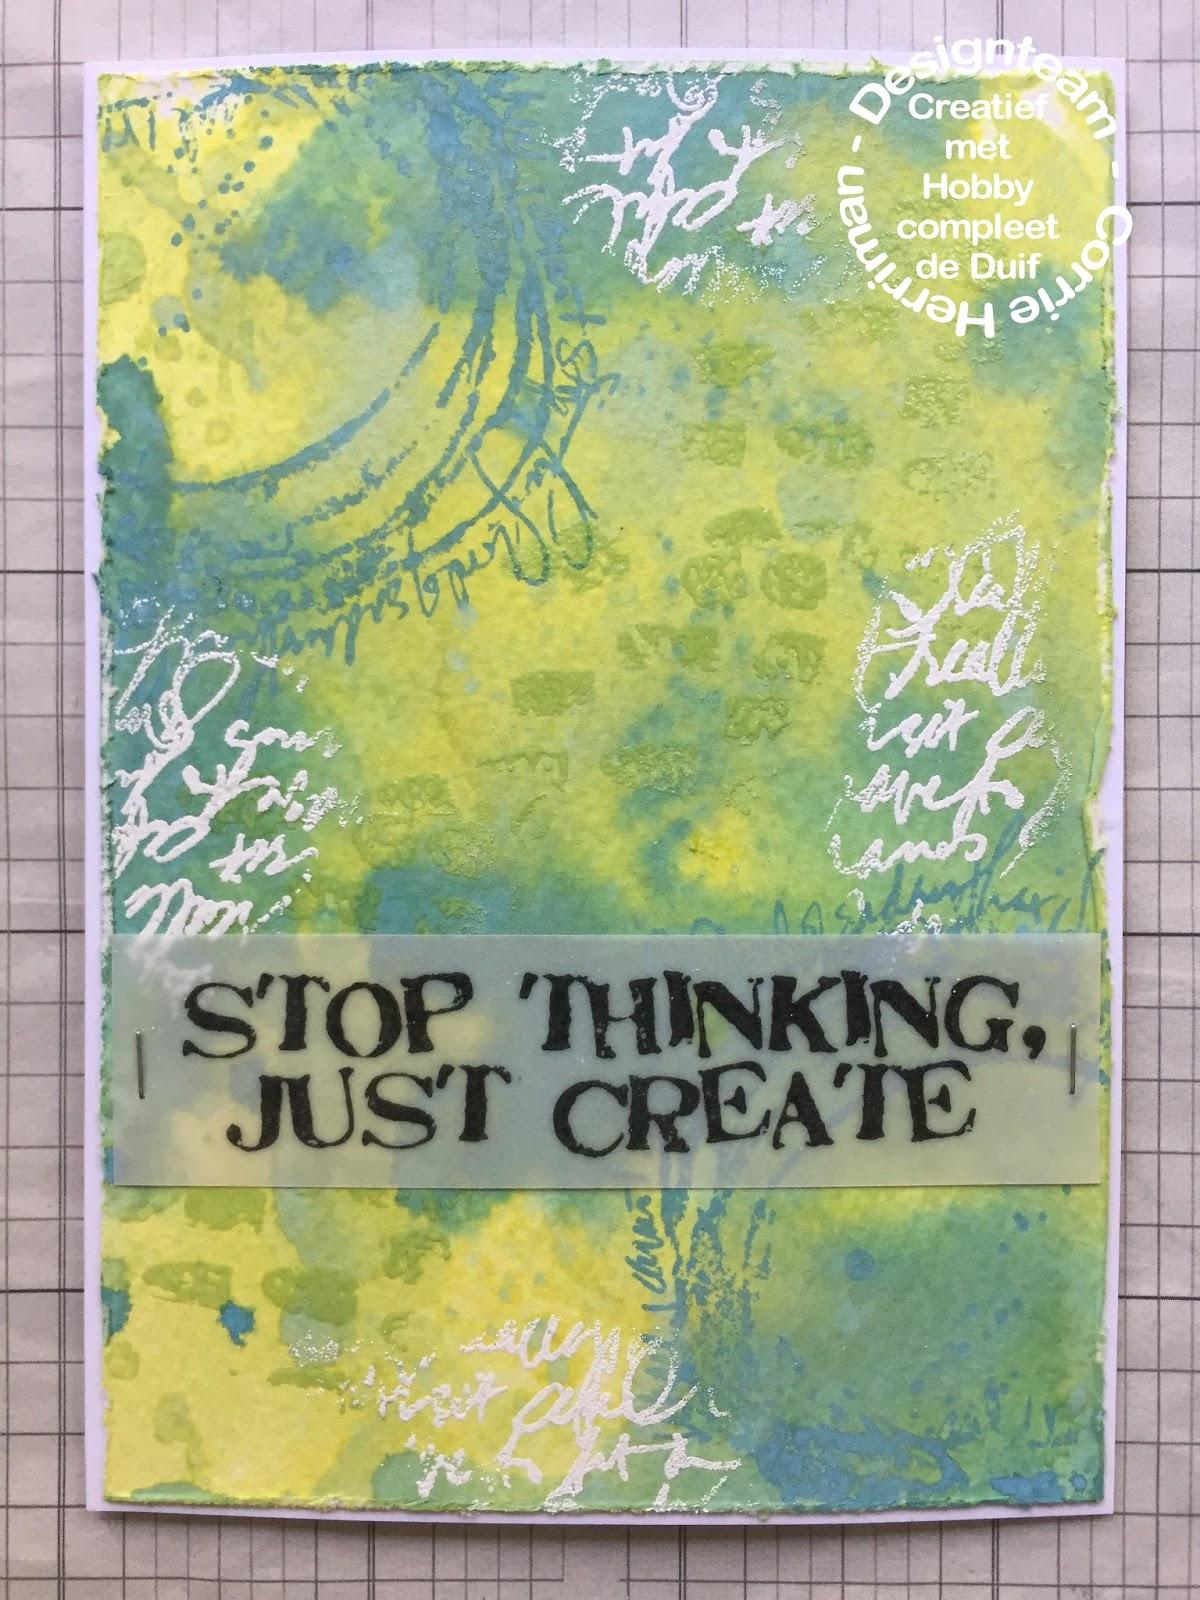 Hobbycompleet De Duif.Madebychook Stop Thinking Just Create